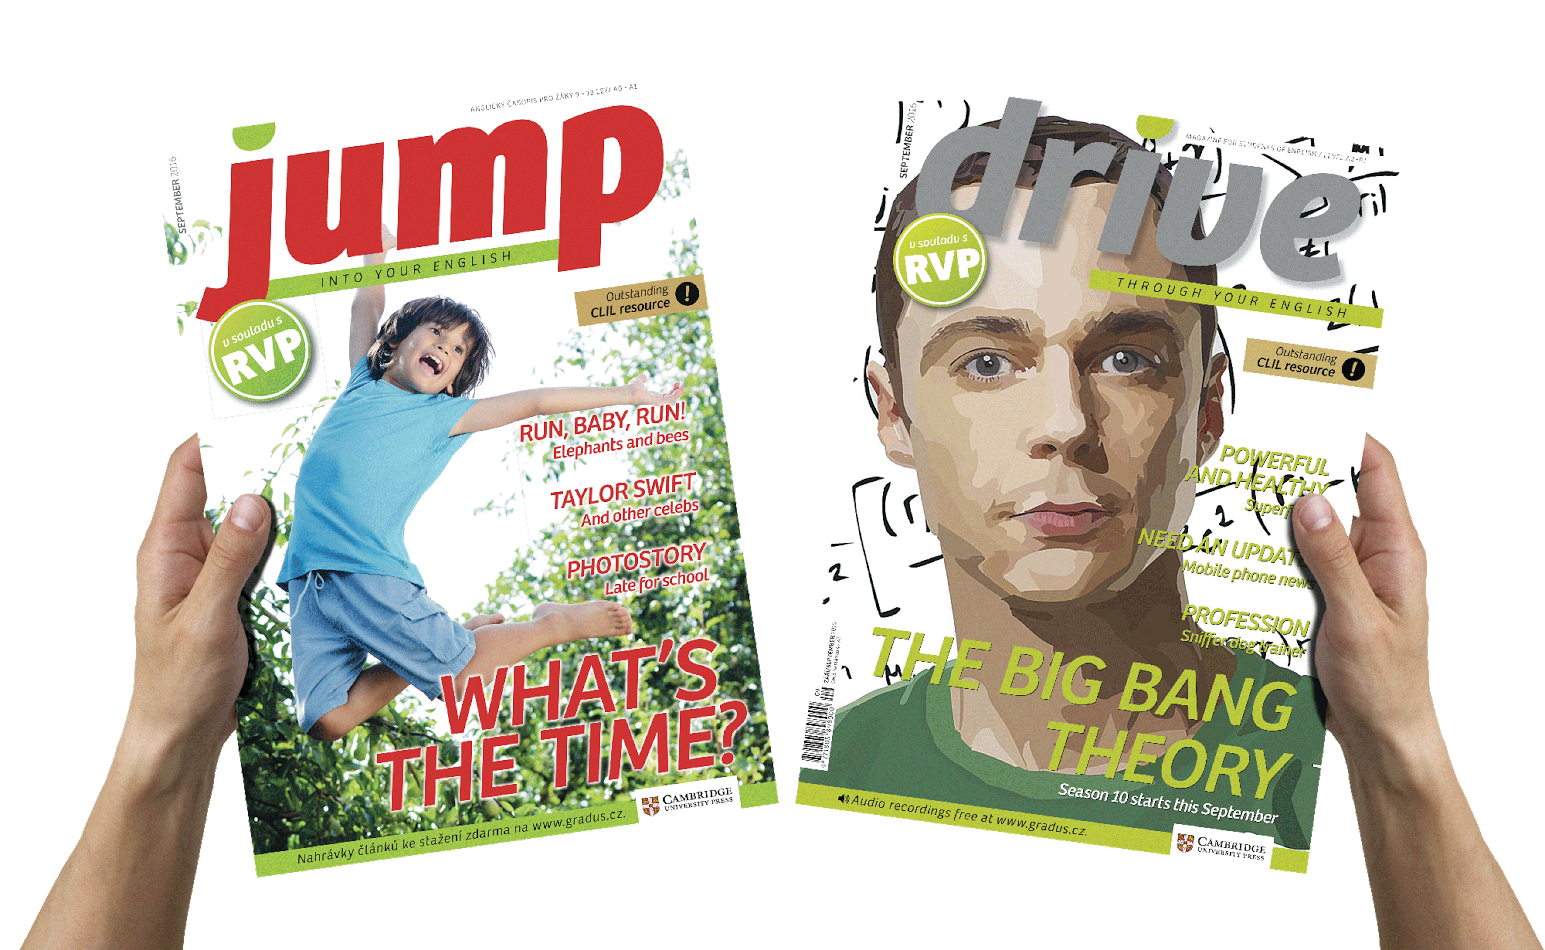 Drive magazine opened.